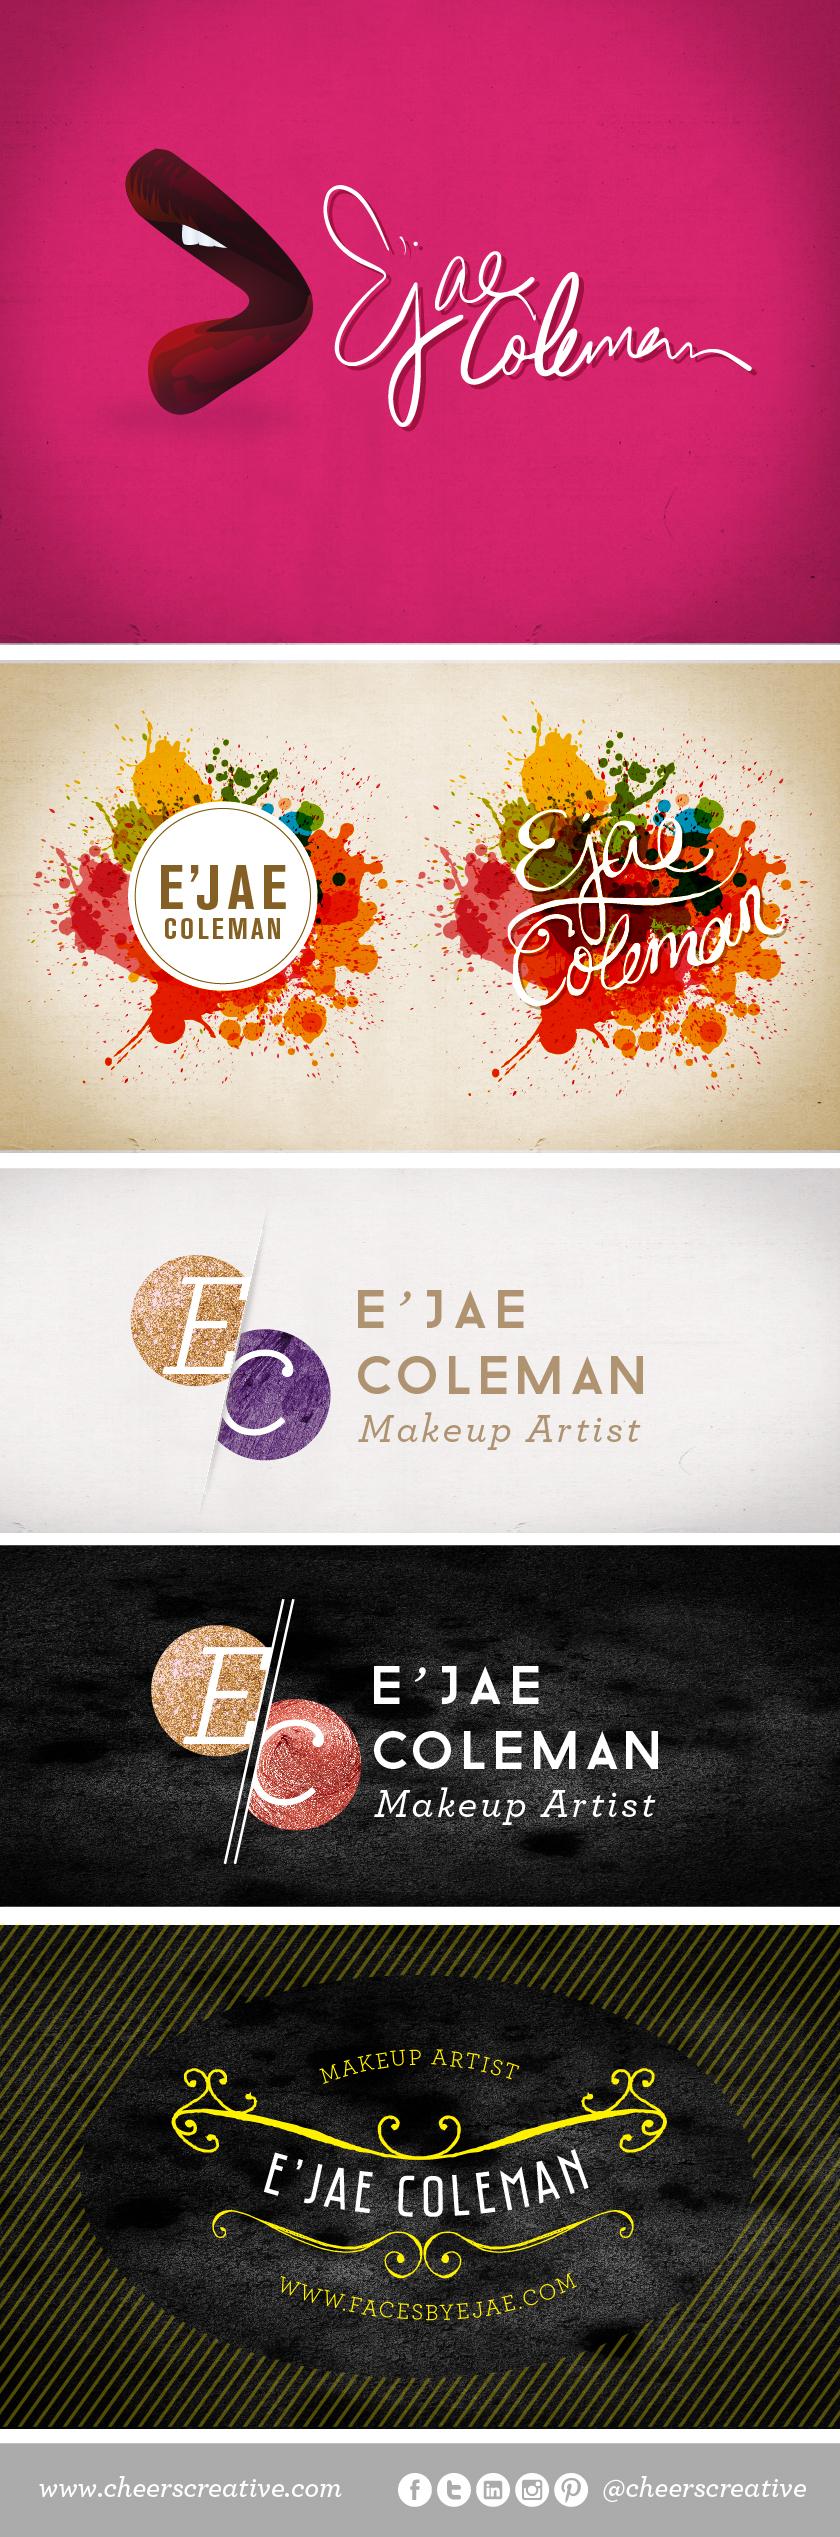 Our Logo Concepts For A Makeup Artist Www Cheerscreative Com Makeup Logo Perfume Logo Graphic Design Inspiration